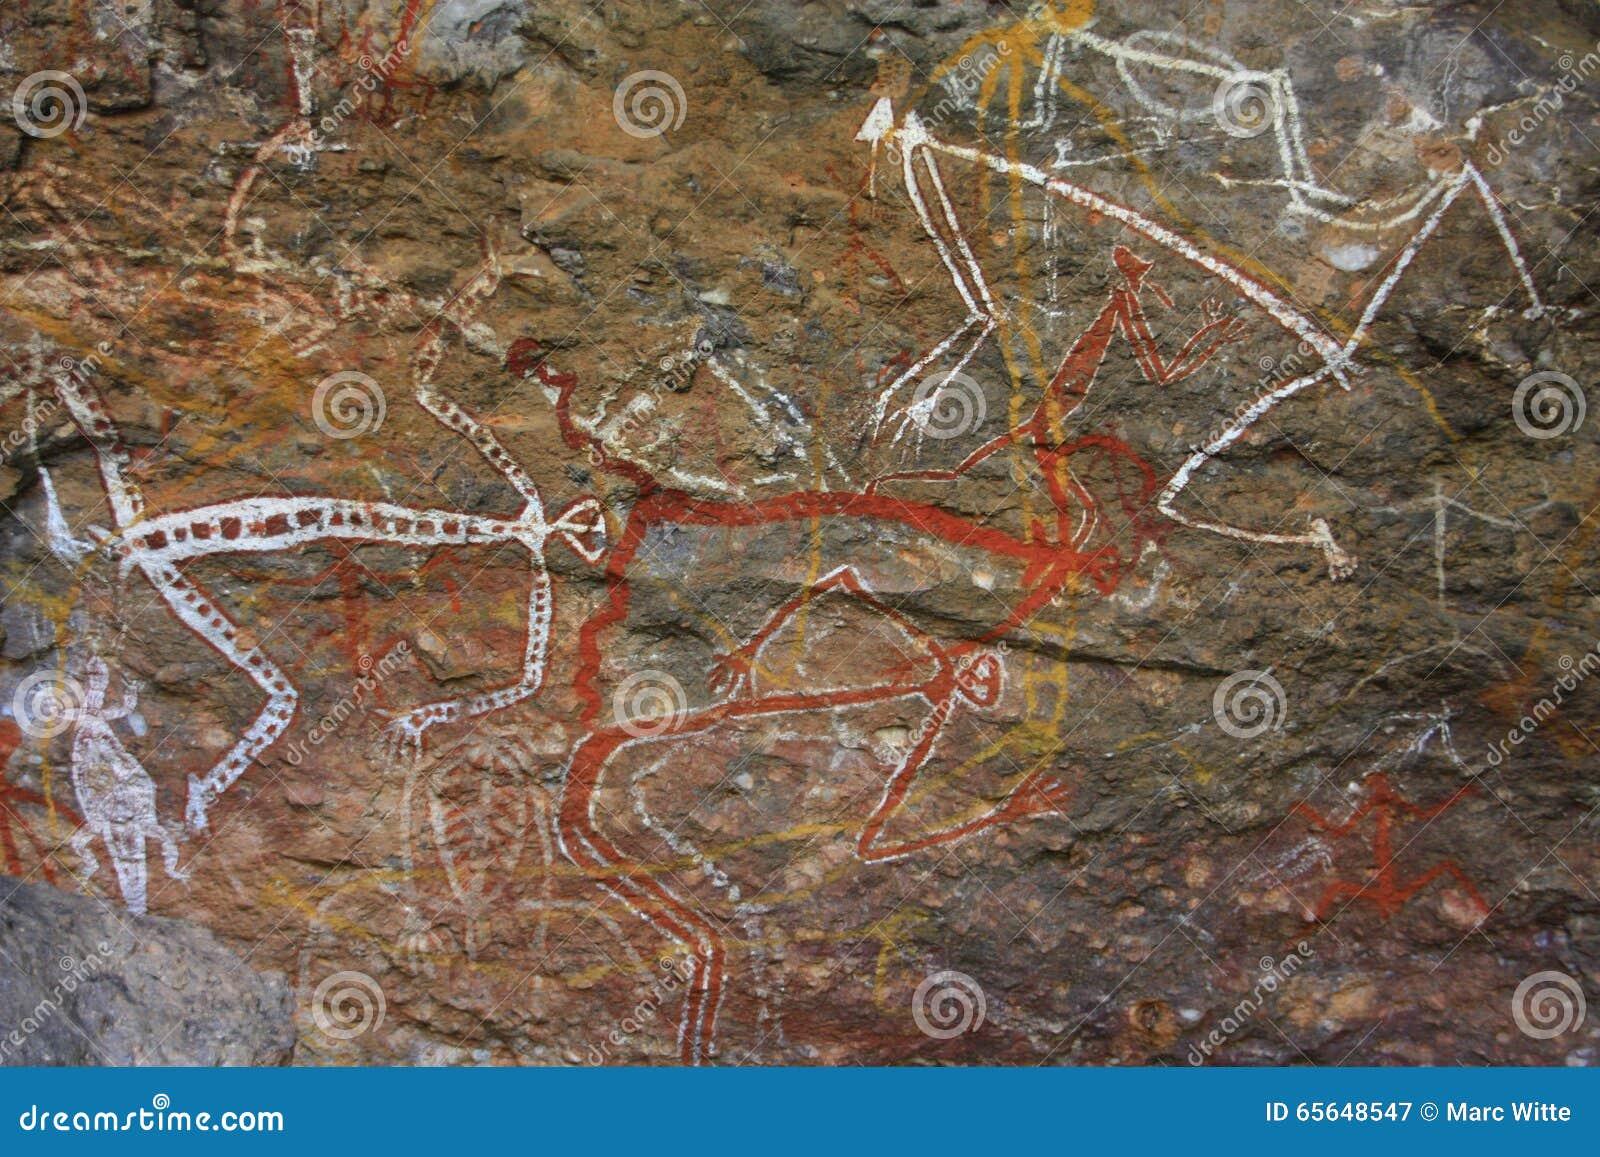 Basculez l art chez Ubirr, parc national de kakadu, Australie